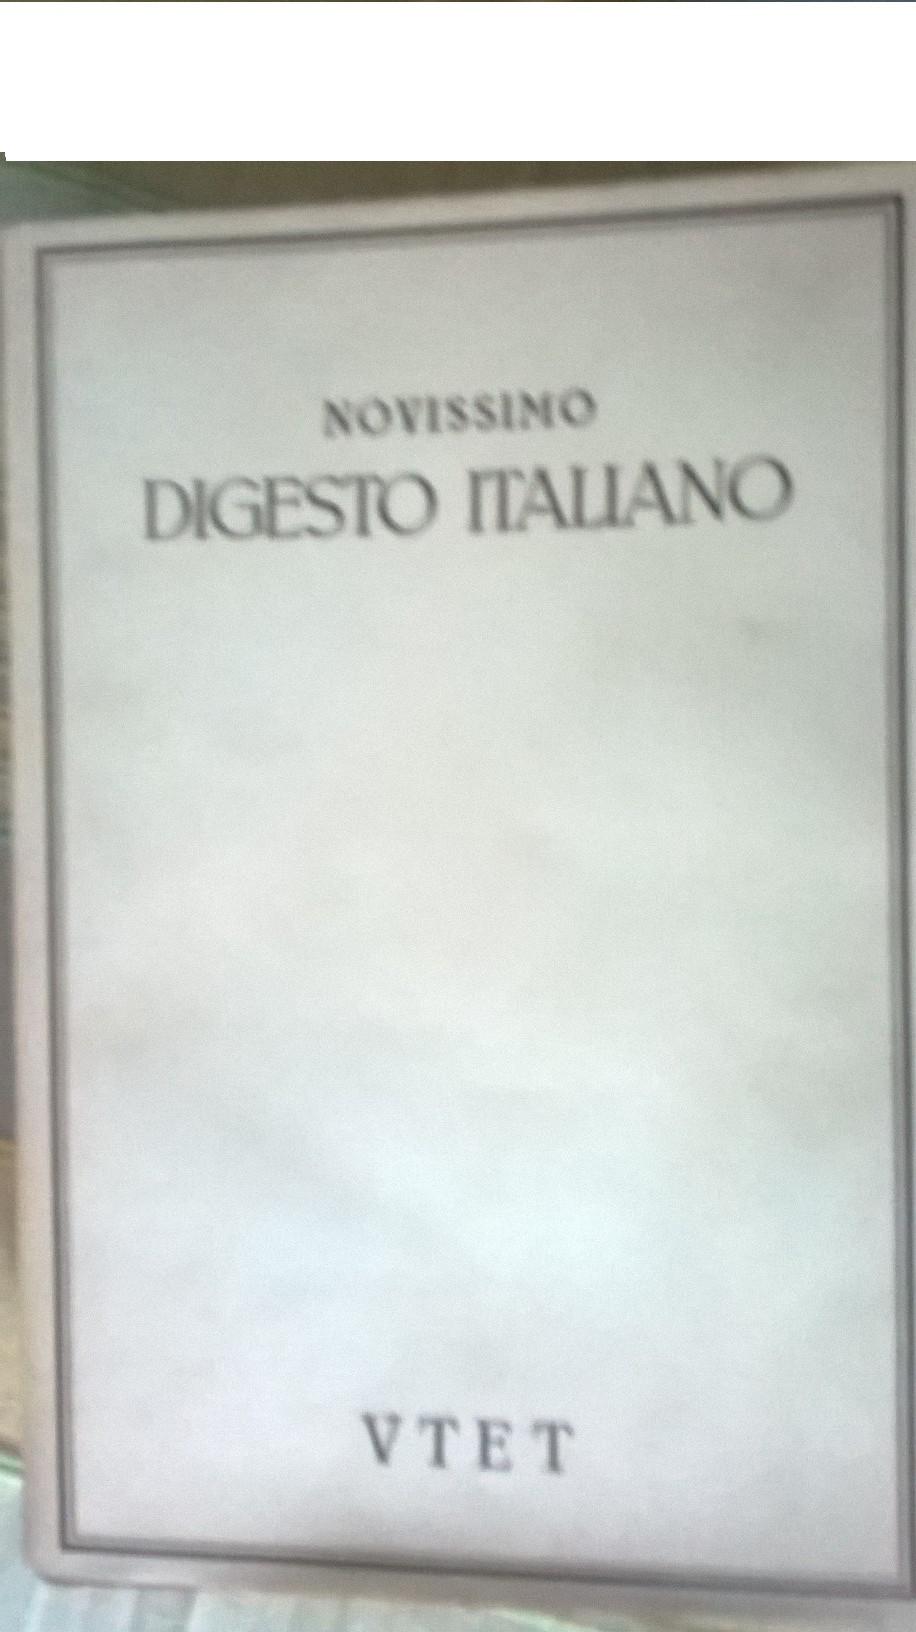 Novissimo digesto italiano - vol. XIII